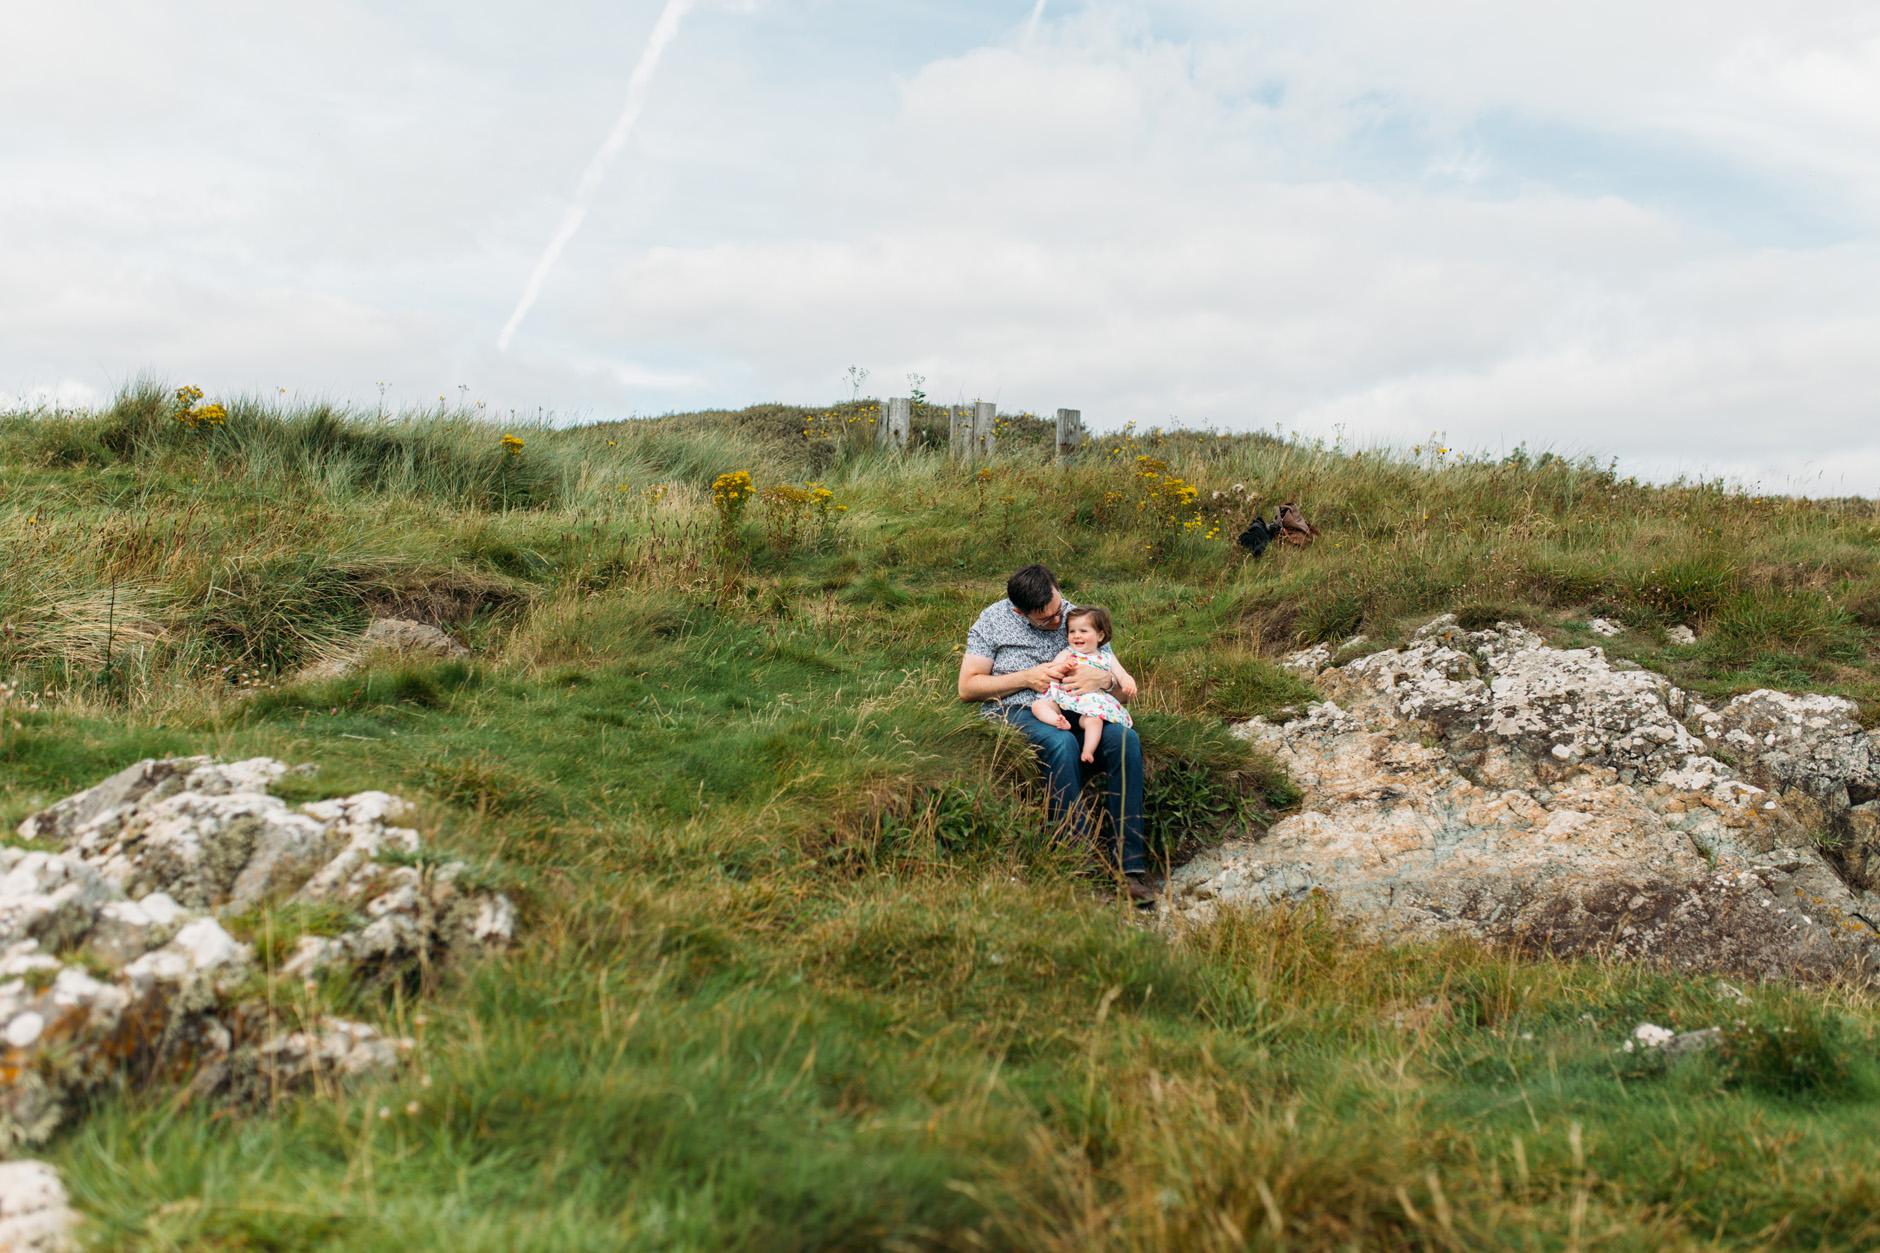 candid-natural-children-family-photographer-dublin-0113.jpg